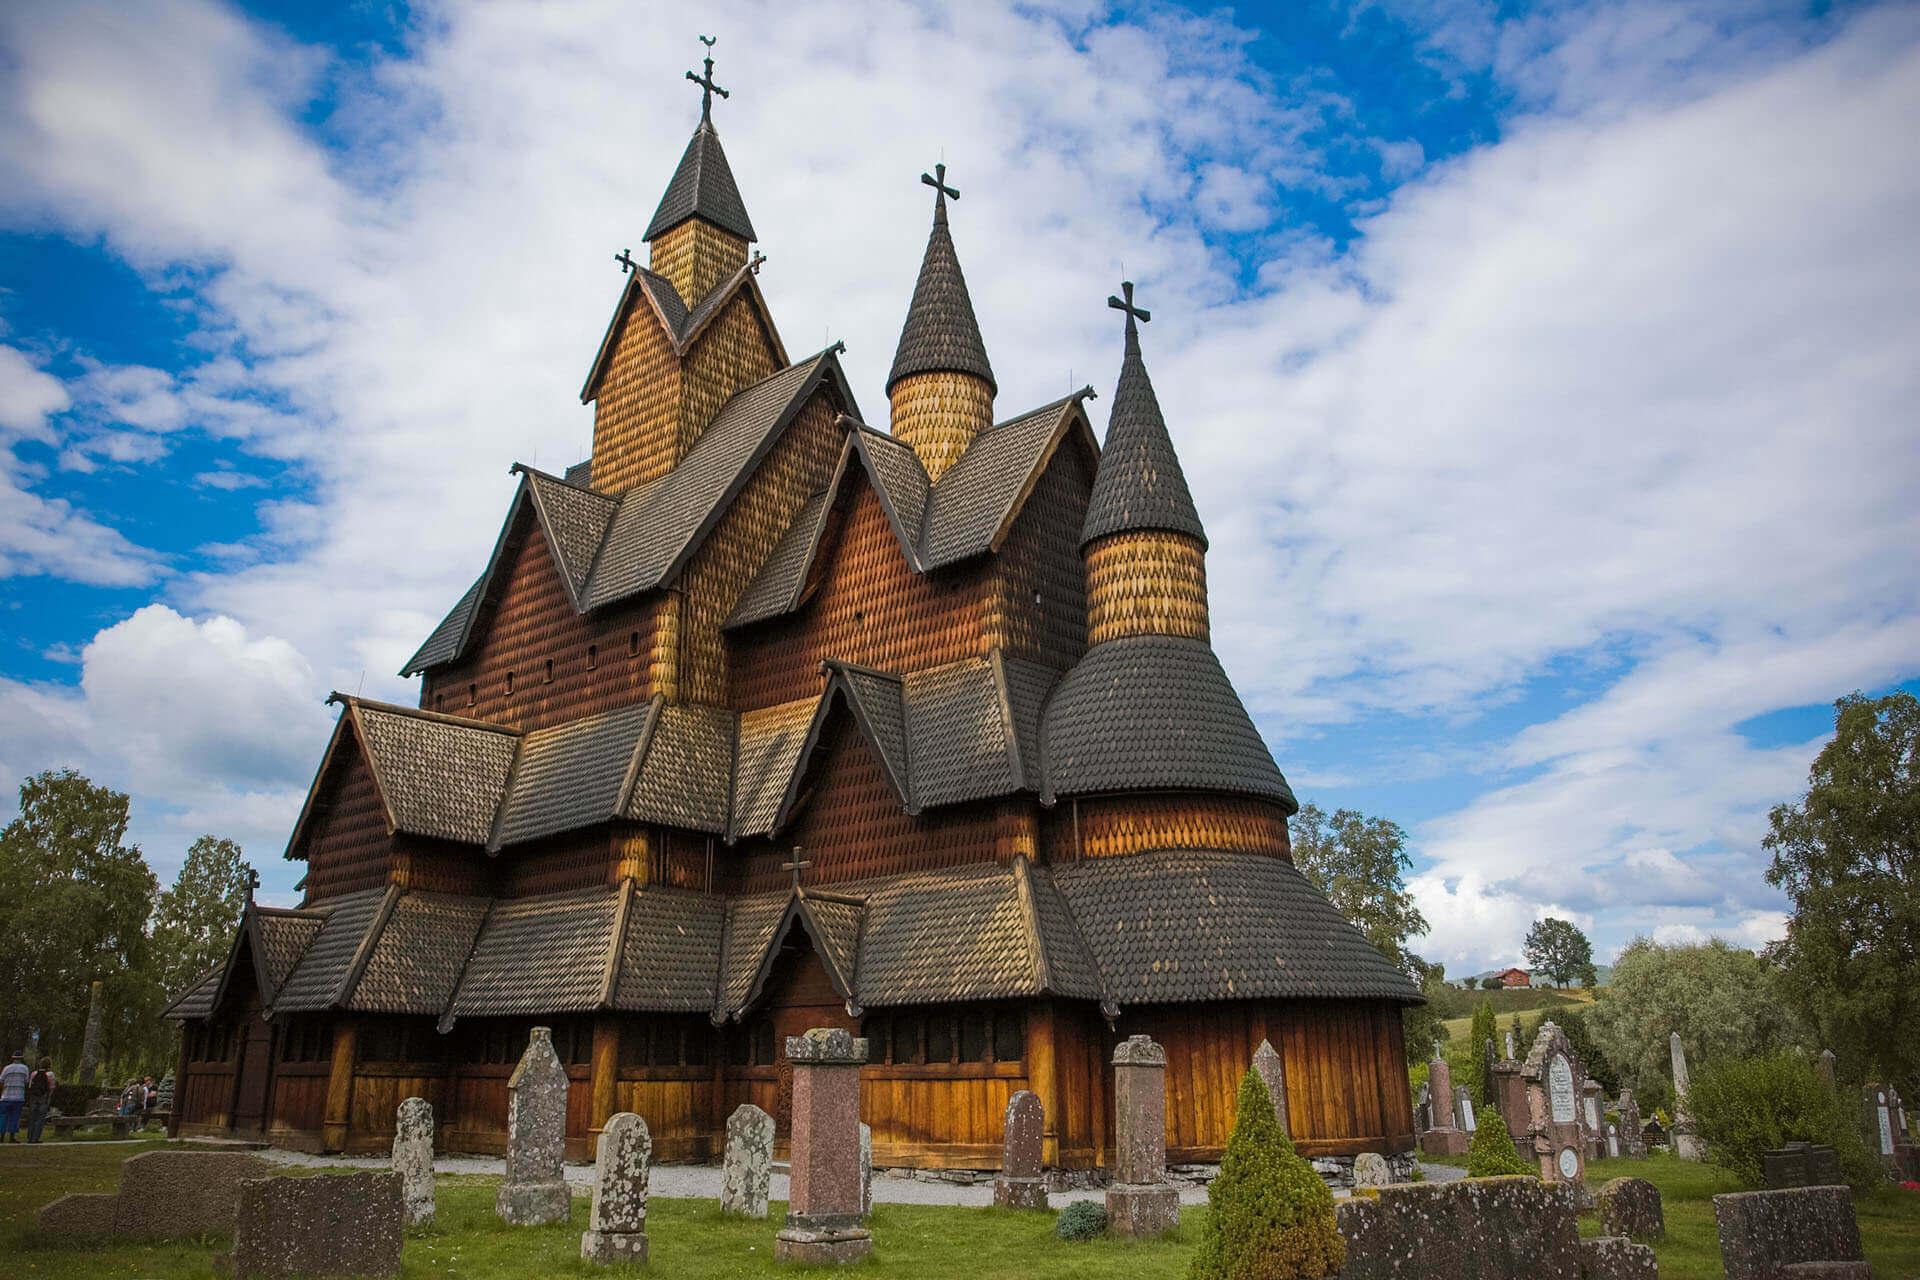 Norway: Norwegians No Longer Advised to Avoid Global Travel